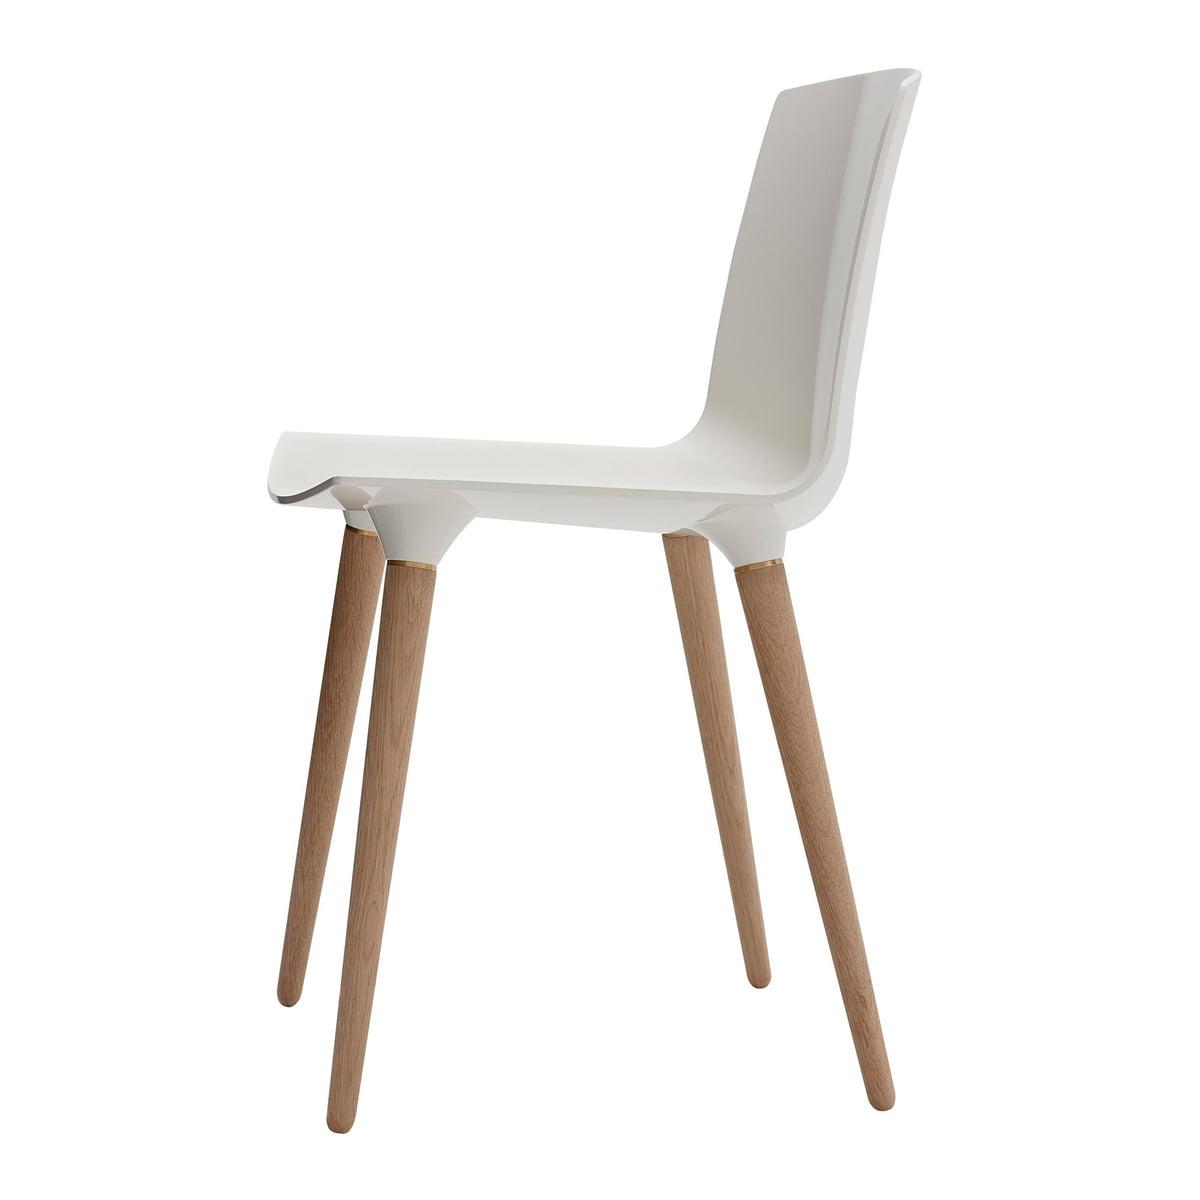 Andersen Furniture Tac Stuhl Eiche Geseift Weiss Ral 9010